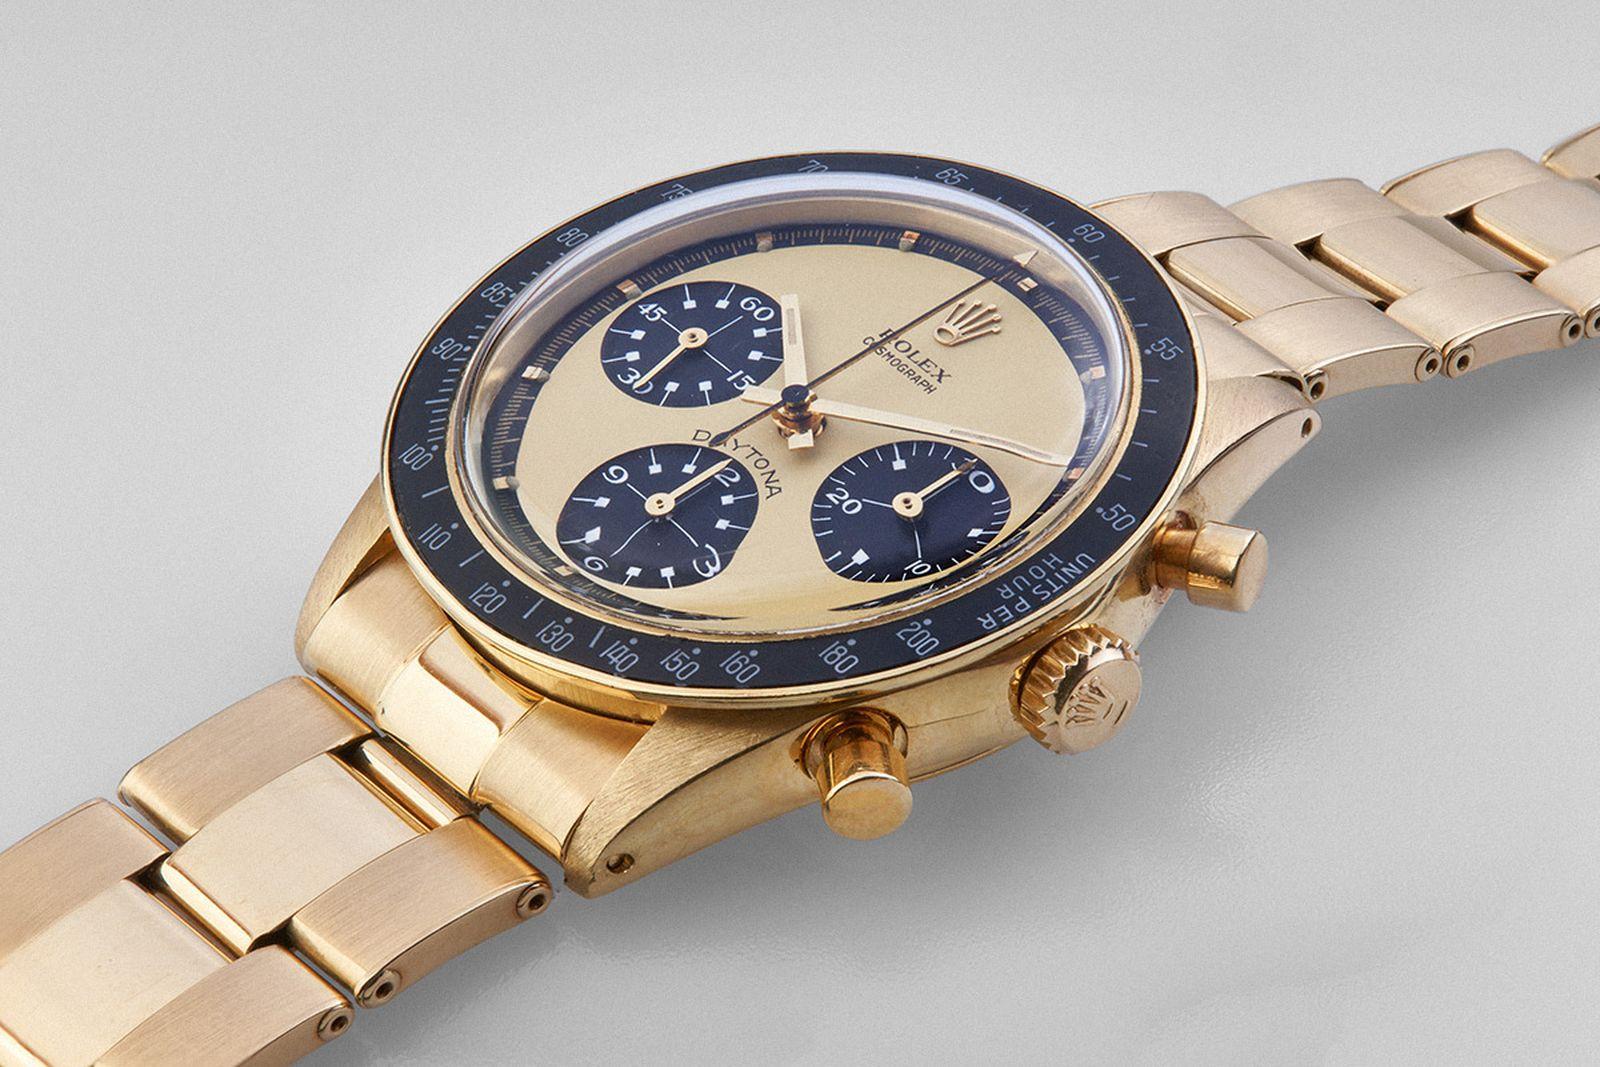 rolex-watches-phillips-auction-main01